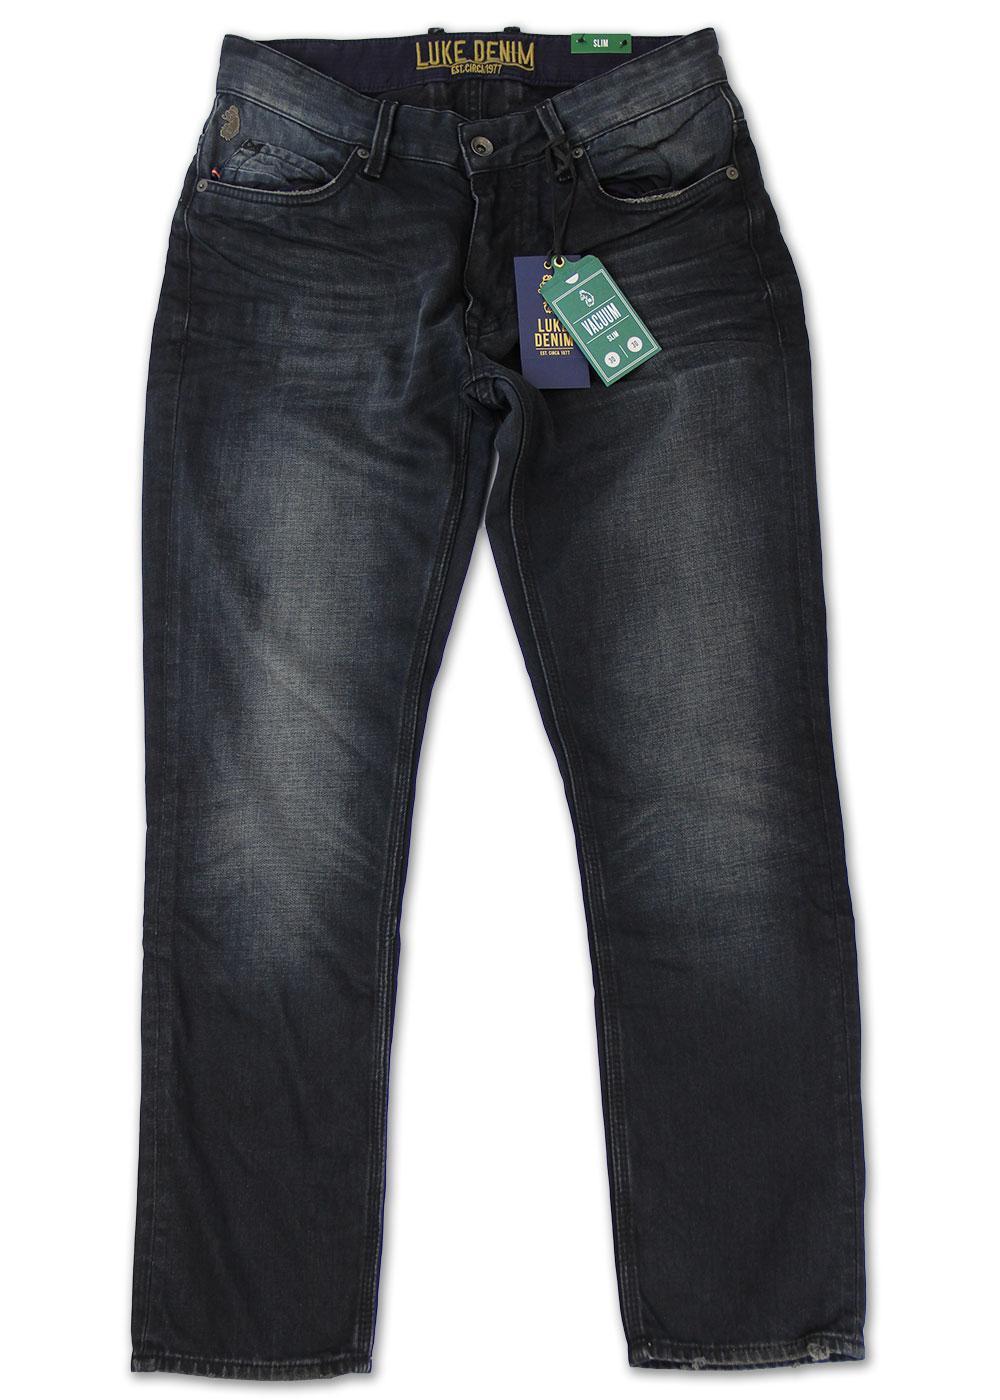 Vacuum LUKE 1977 Retro Wash Slim Fit Jeans (BY)